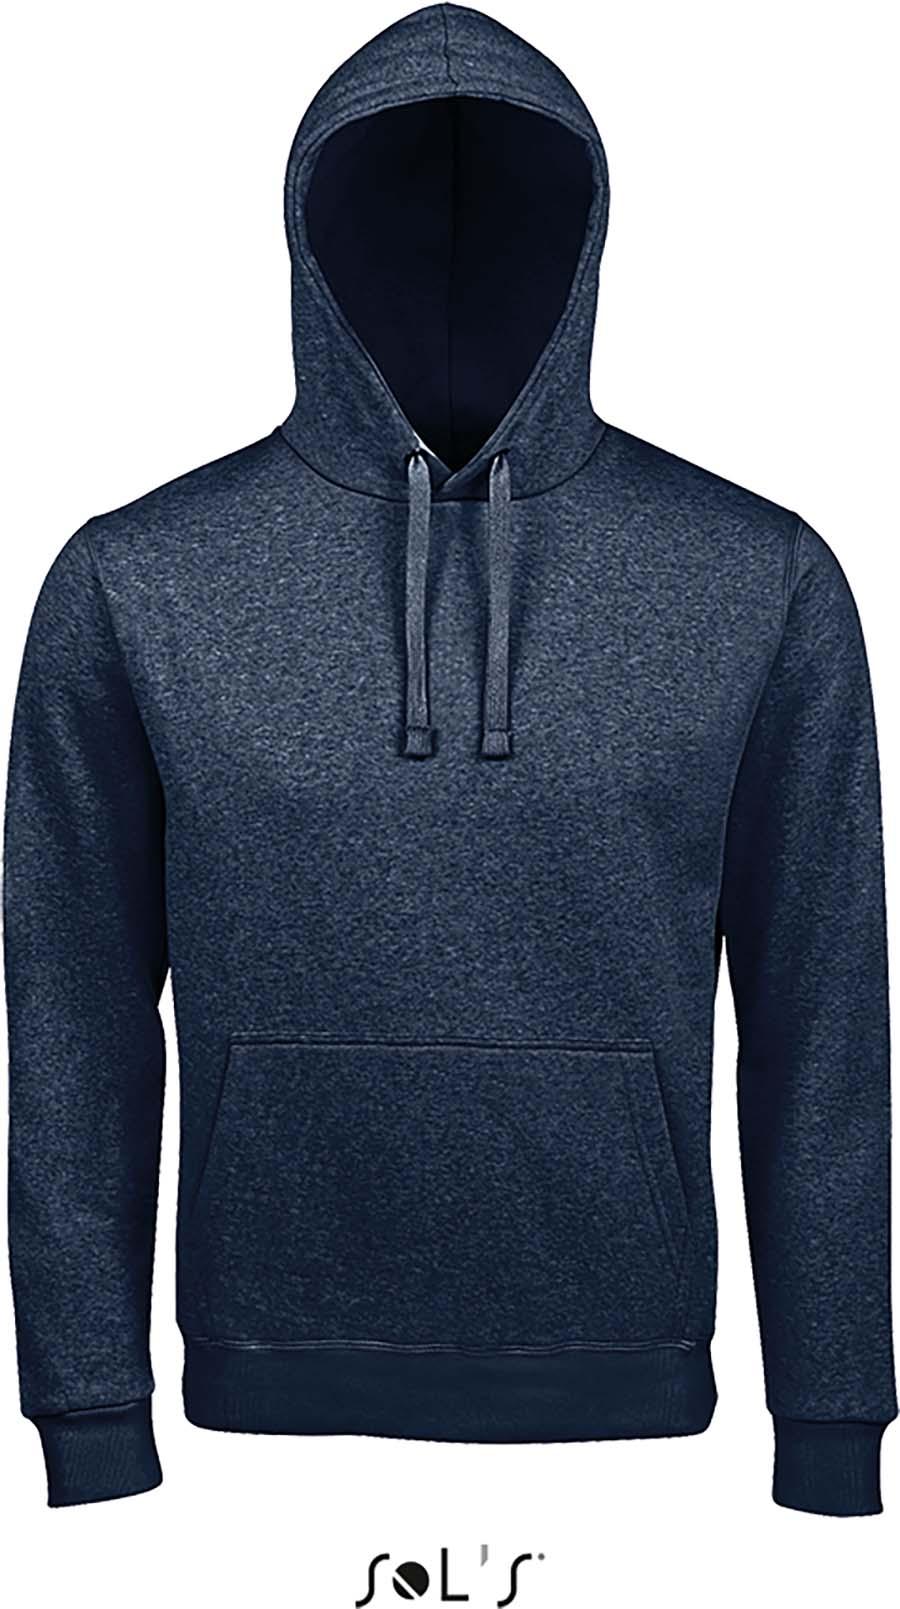 Sweat-shirt unisexe à capuche - 1-1403-5